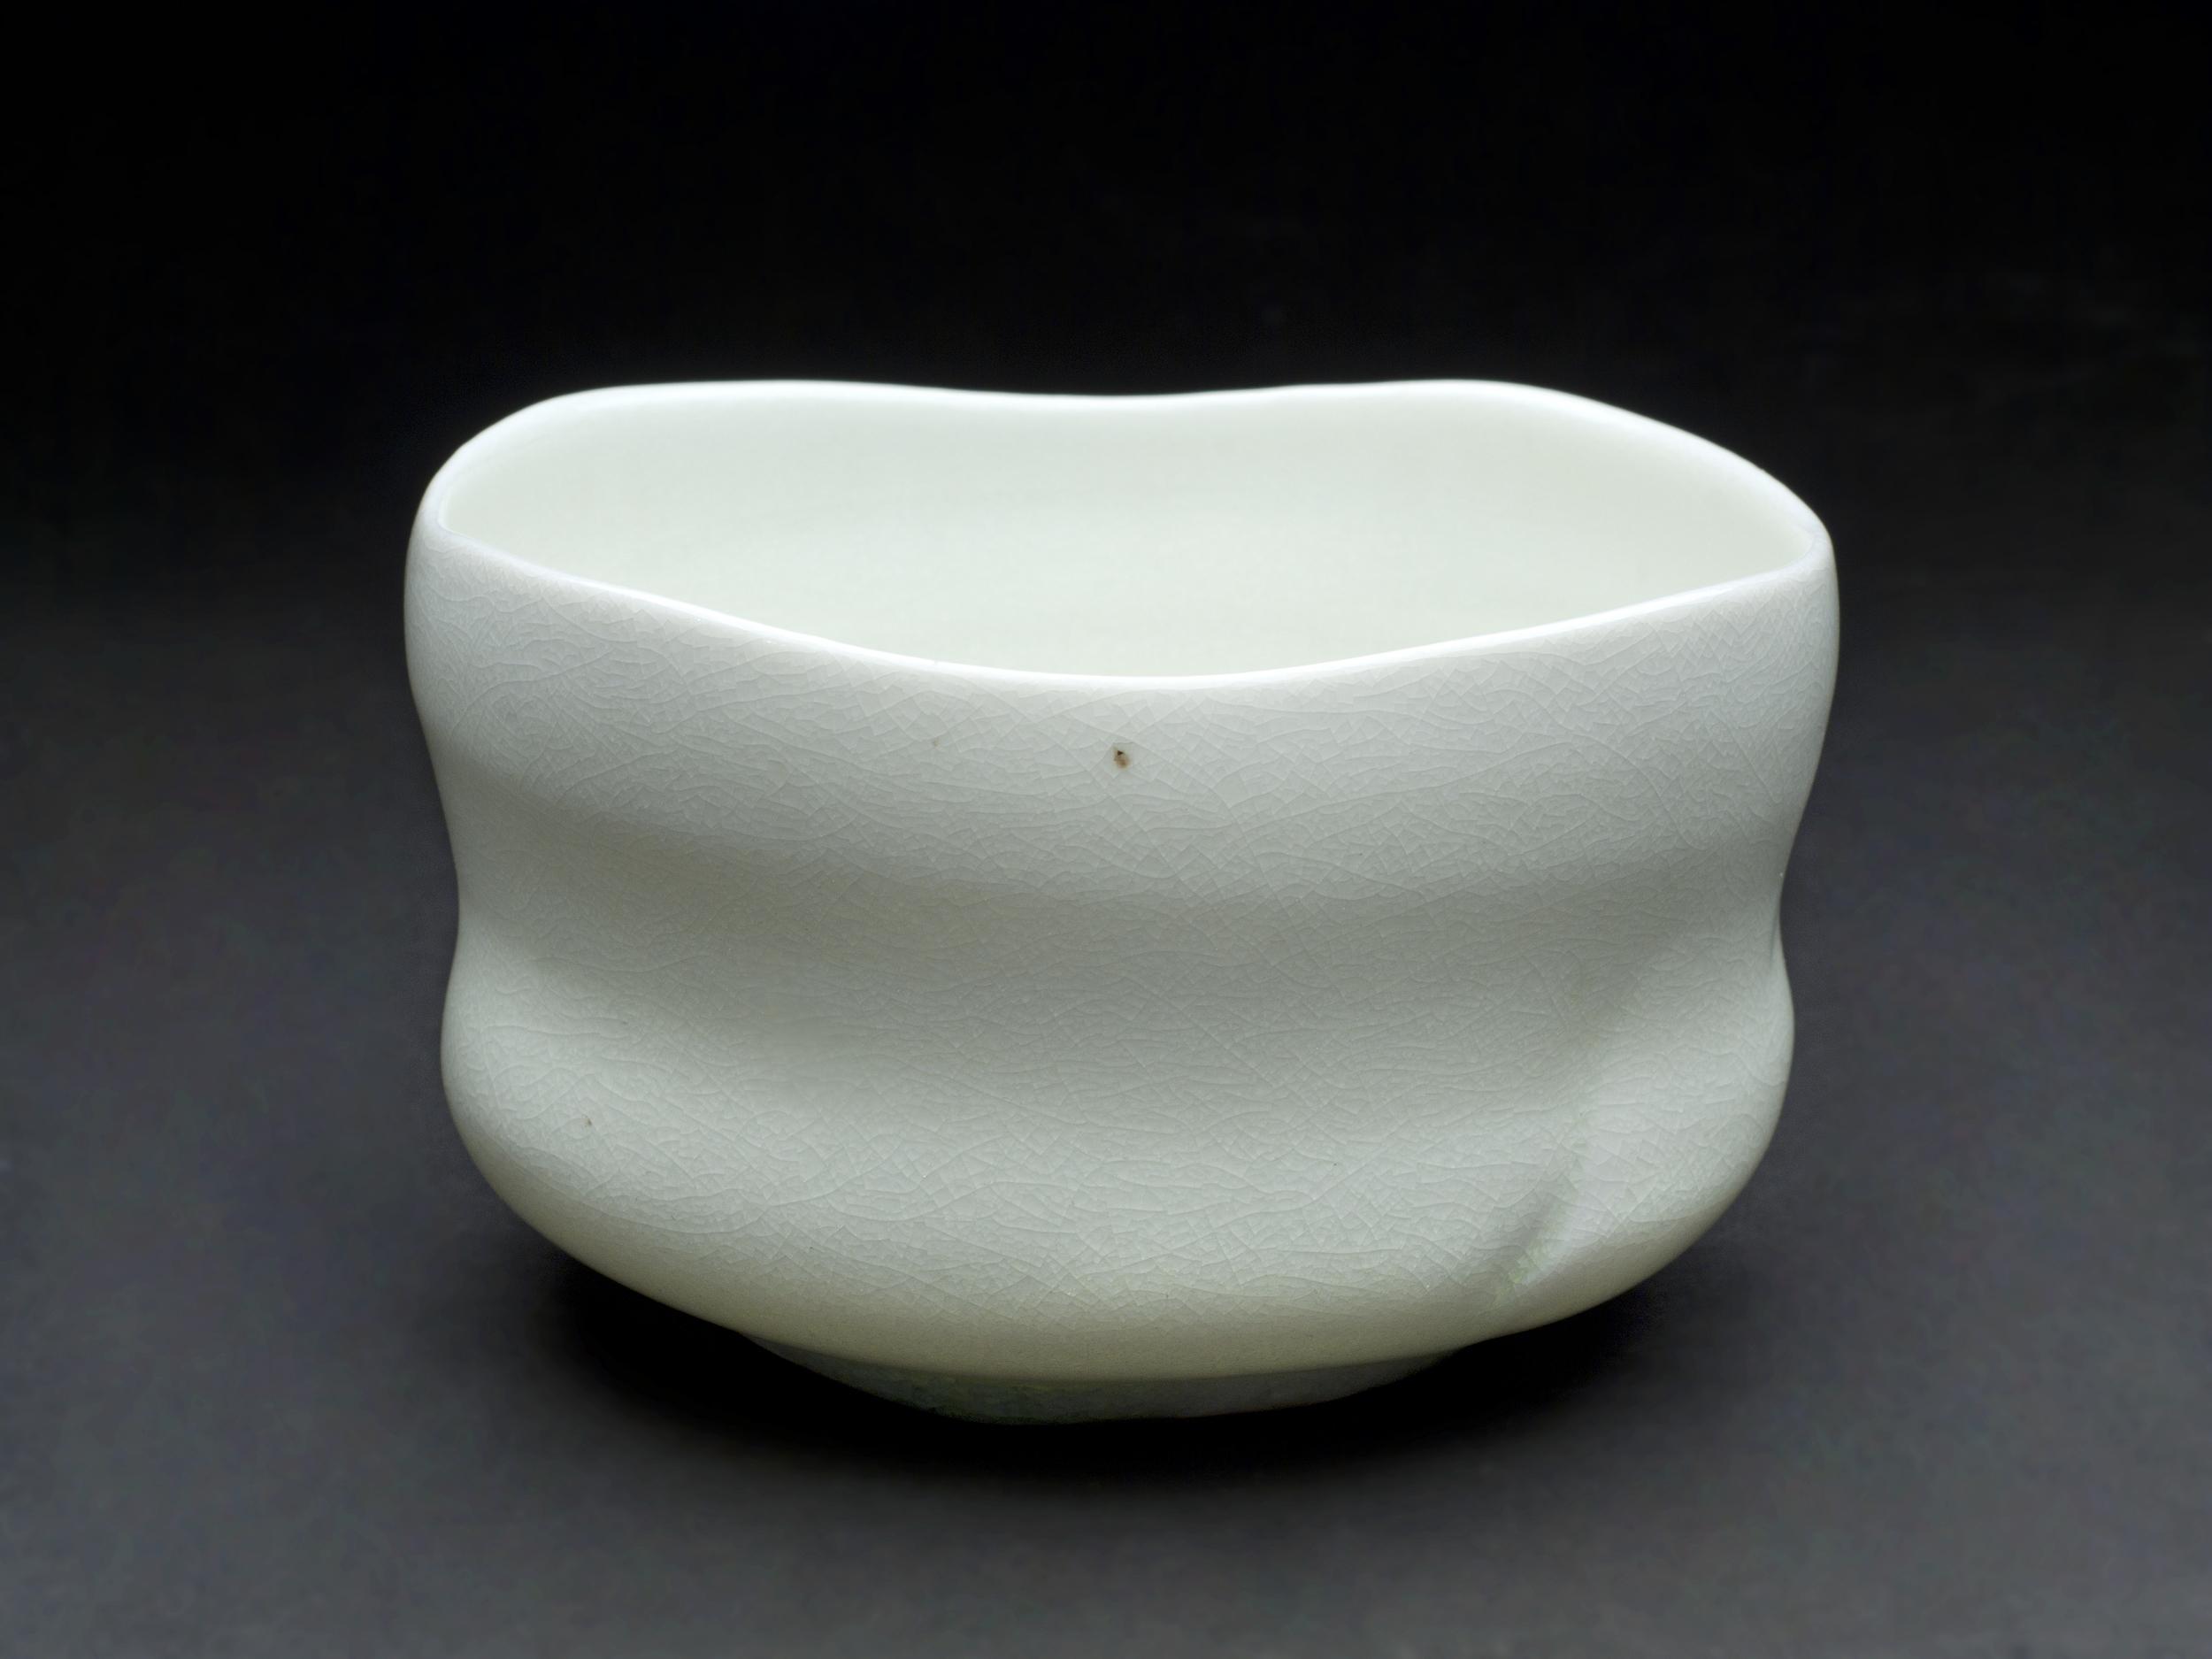 Sandy Lockwood    Chawan  , 2012 Woodfired and saltglazed porcelain 3 x 5 inches / 7.6 x 12.7 cm / SaL 21